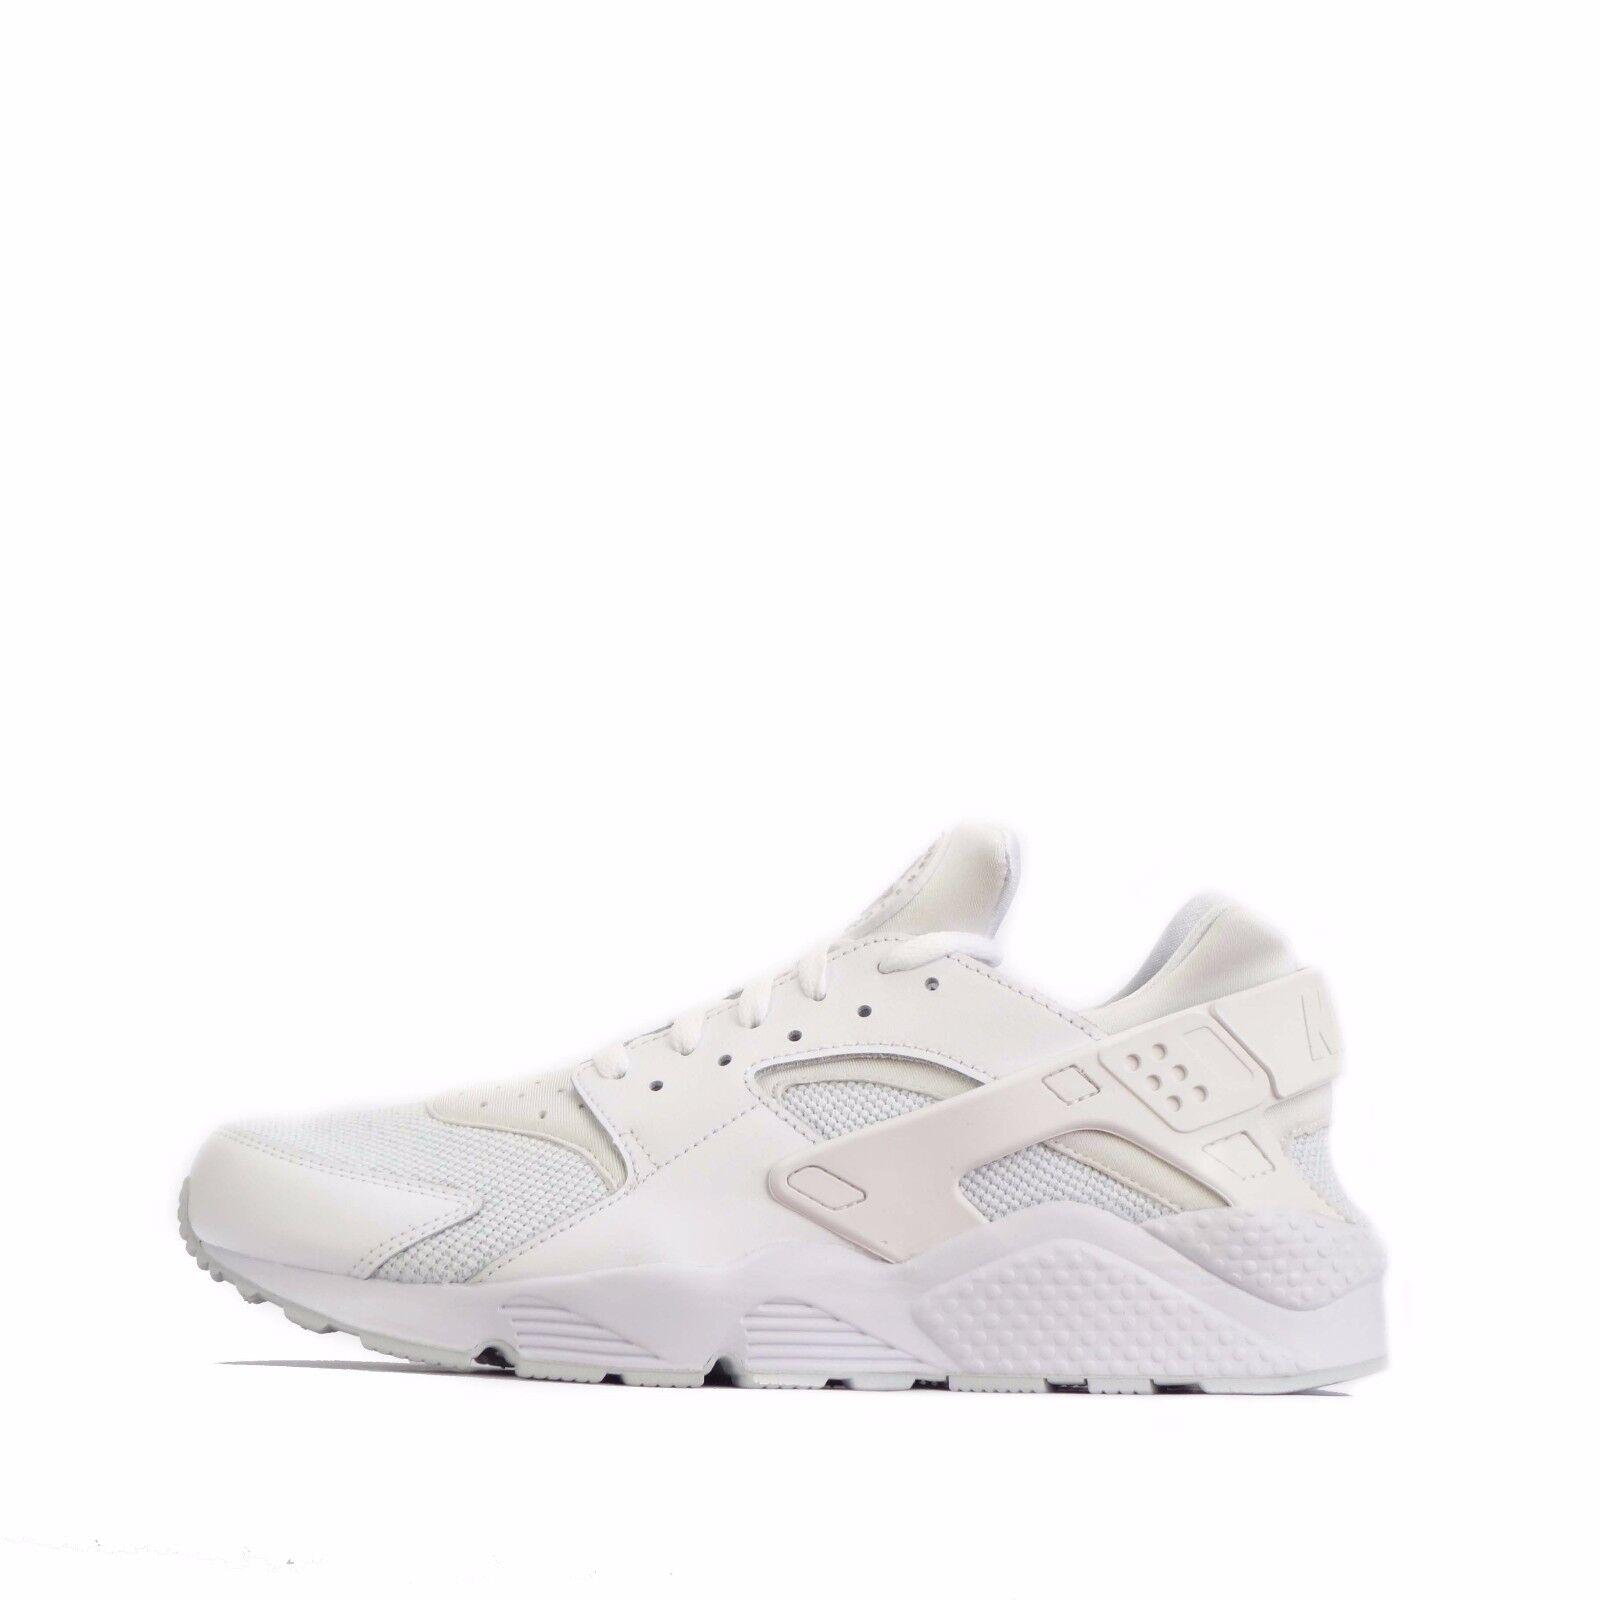 Nike Air Huarache Men's Shoes White/Pure Platinum